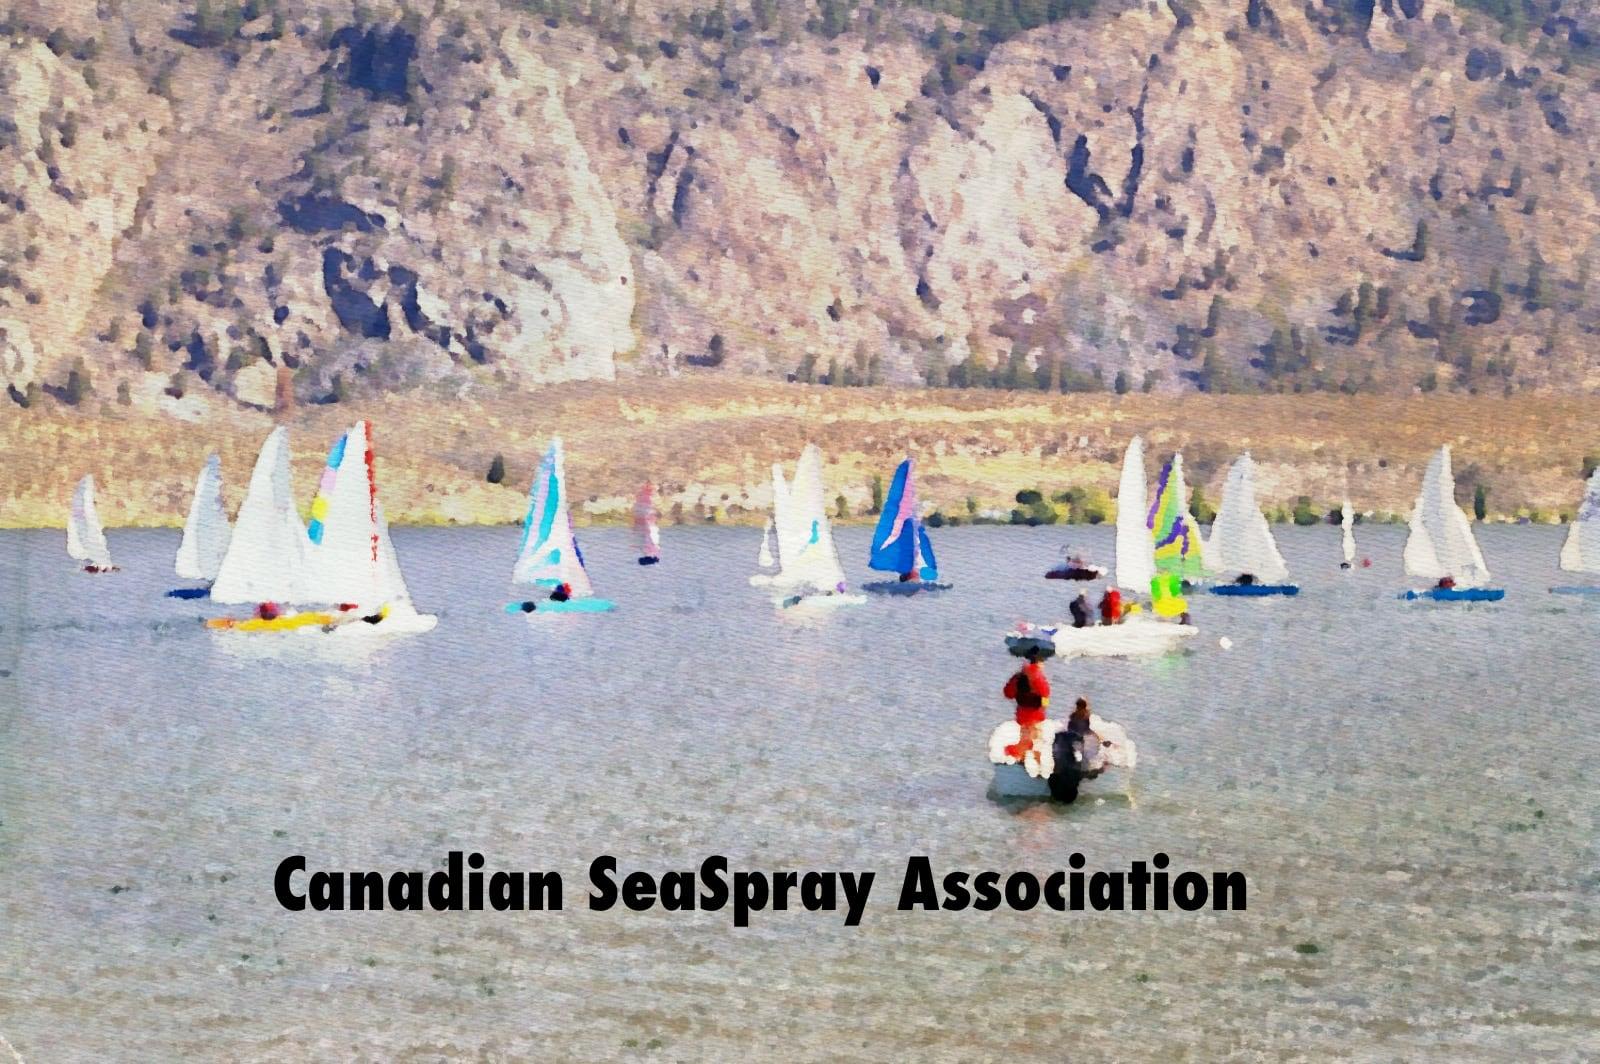 Canadian SeaSpray Association